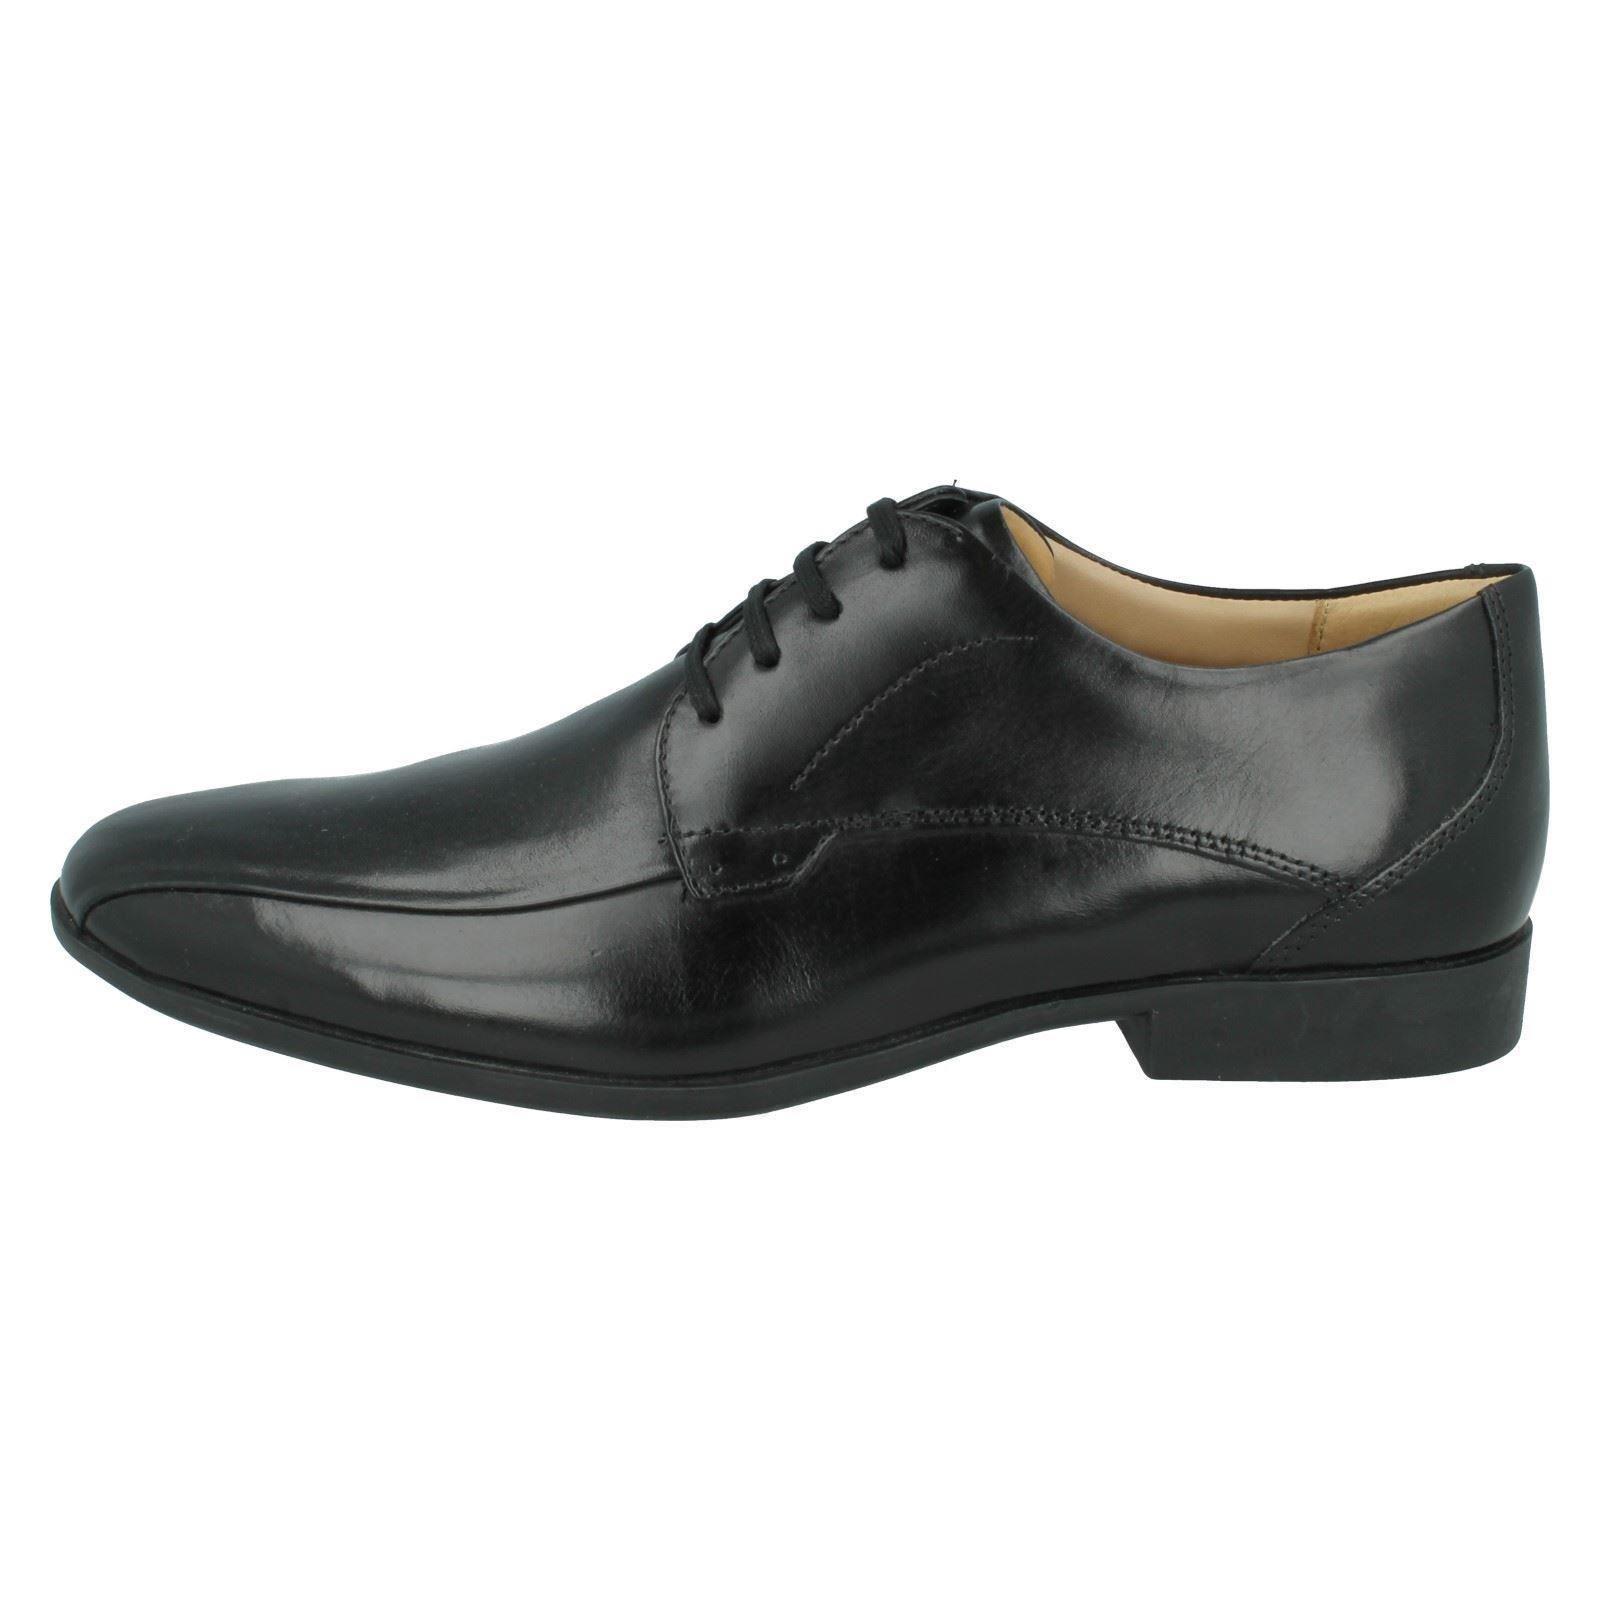 s Anatomic Shoes & Co Formal Shoes Anatomic Tapaua 9fec8a